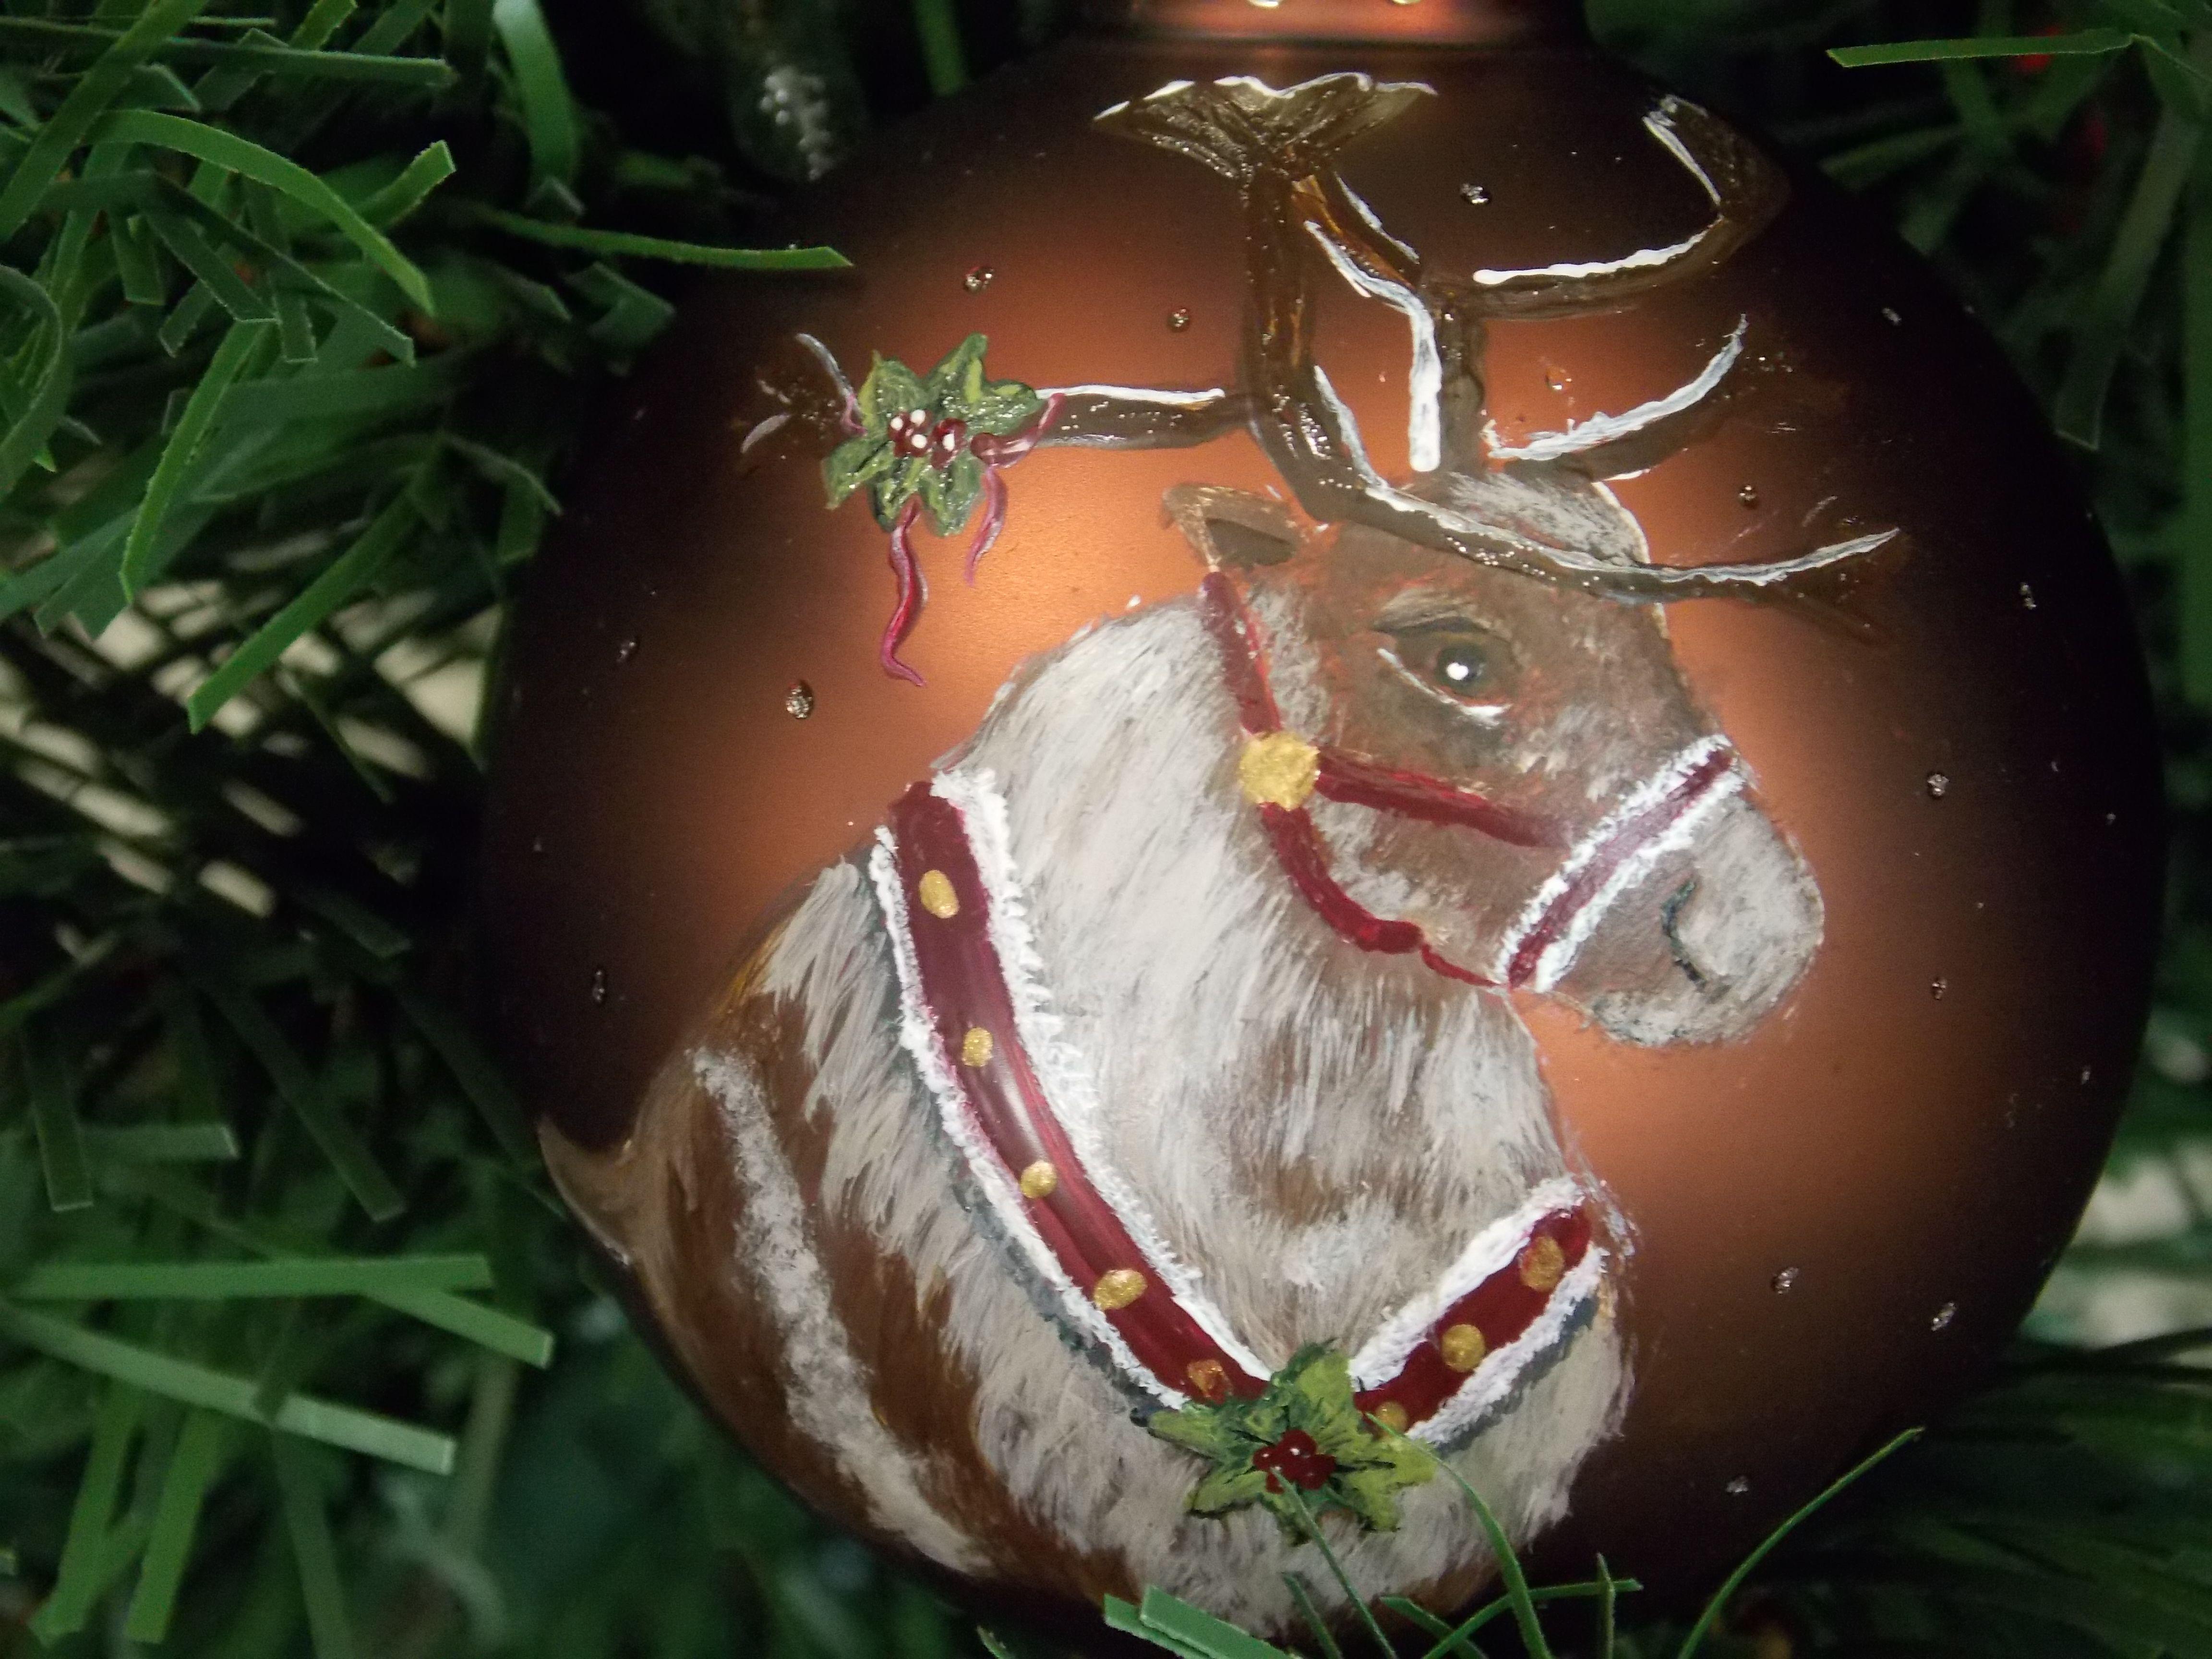 Hand Painted Christmas Ornaments Reindeer (painted By Helen Krupenina)